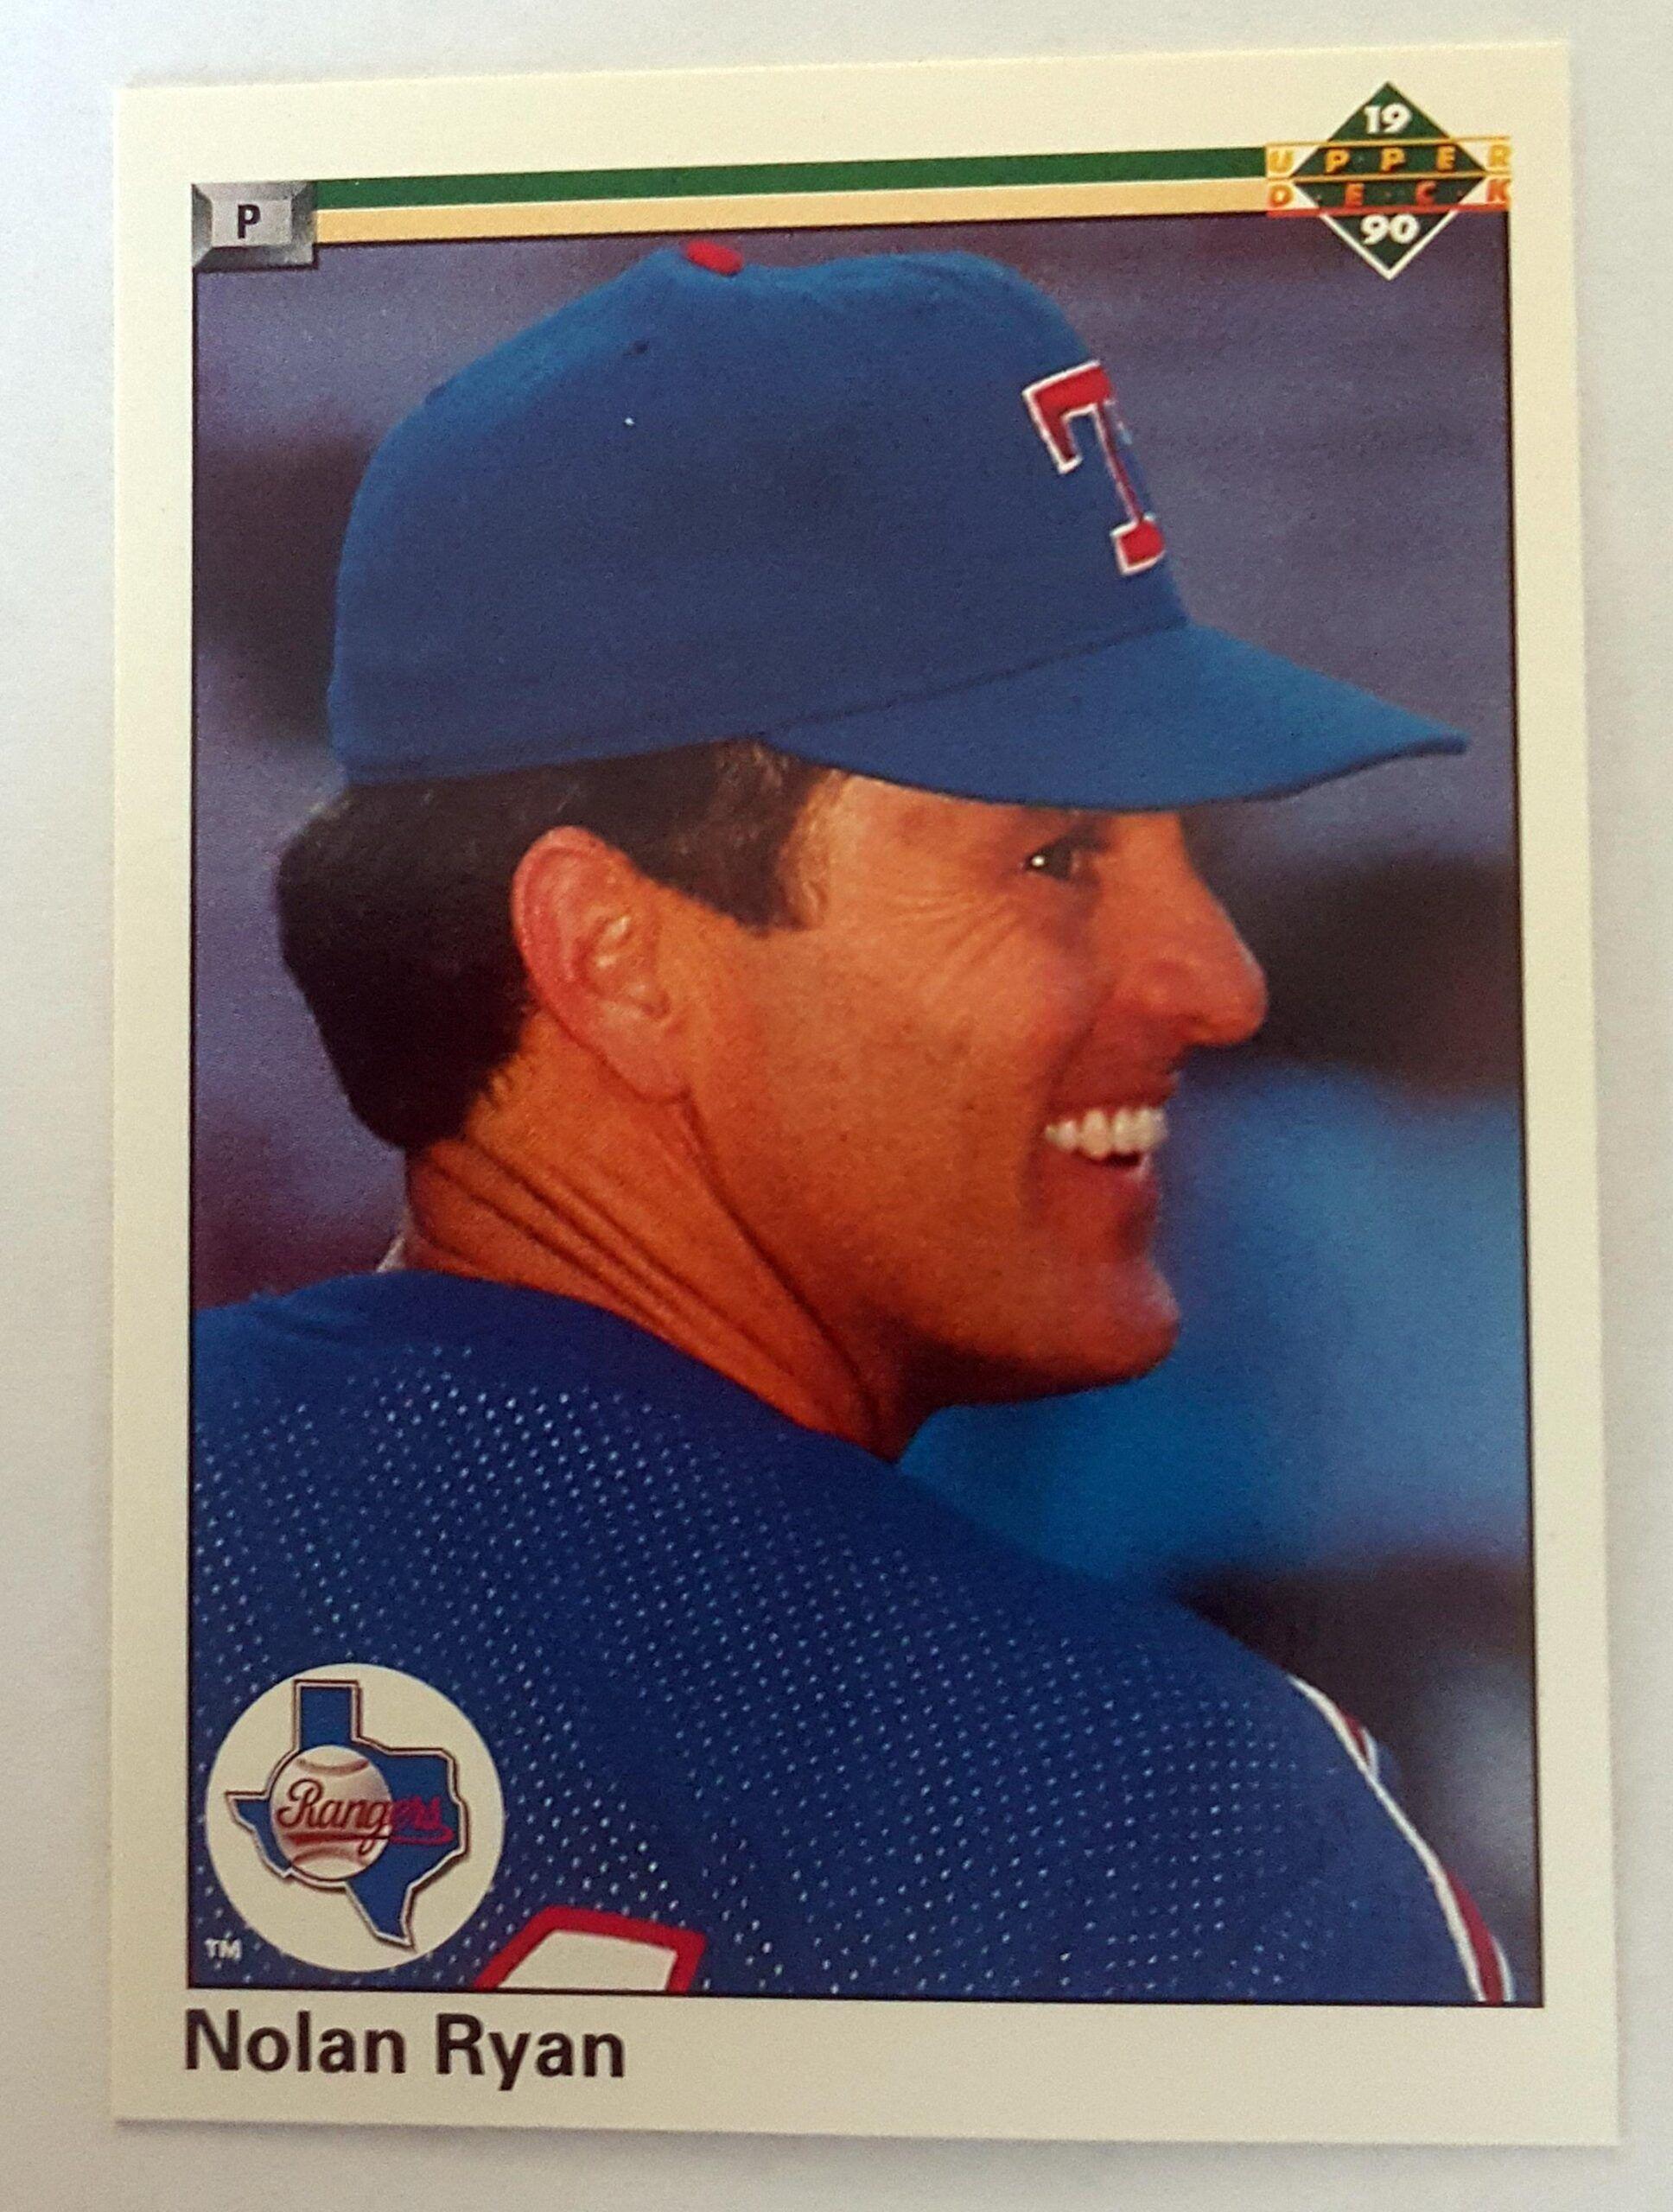 Nolan Ryan Upper Deck 1990 Card 544 Texas Rangers Comics Cards And Nolan Ryan Texas Rangers Upper Deck Baseball Cards